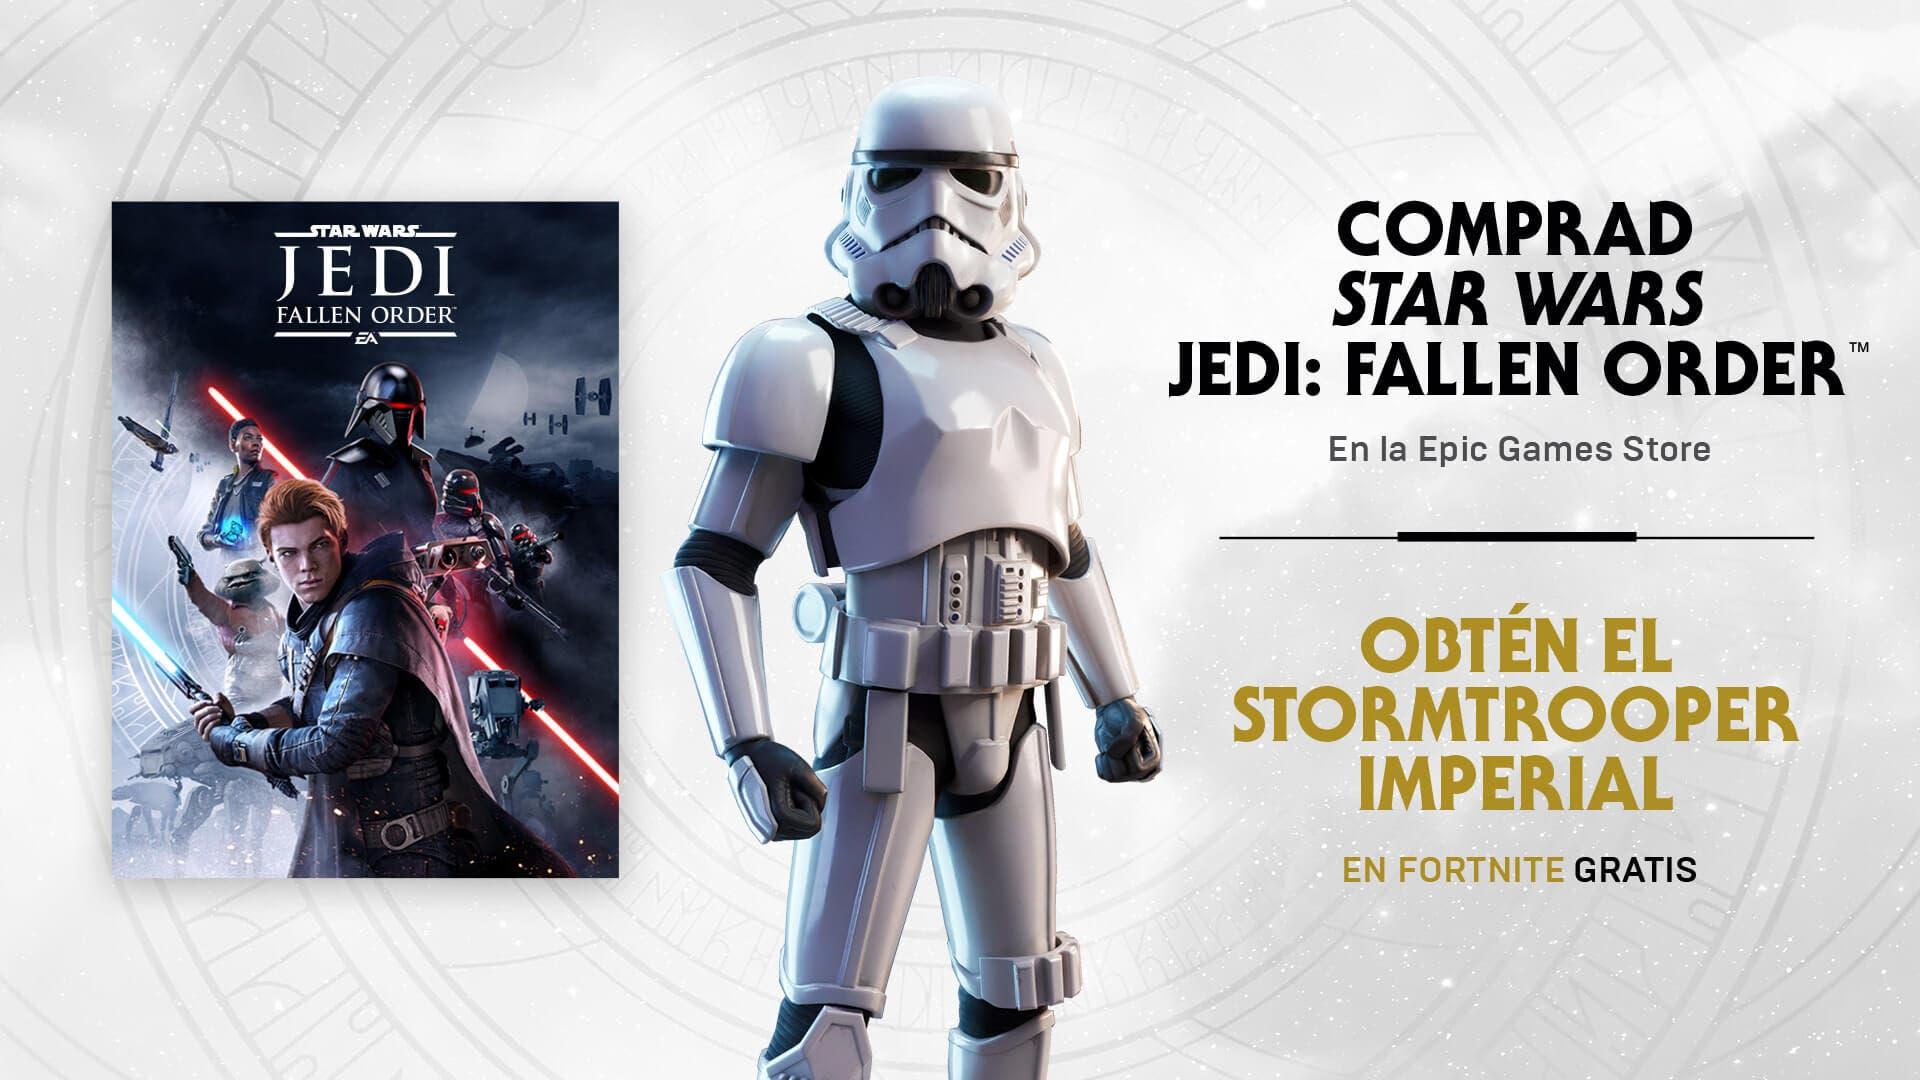 Star Wars llega a Fortnite